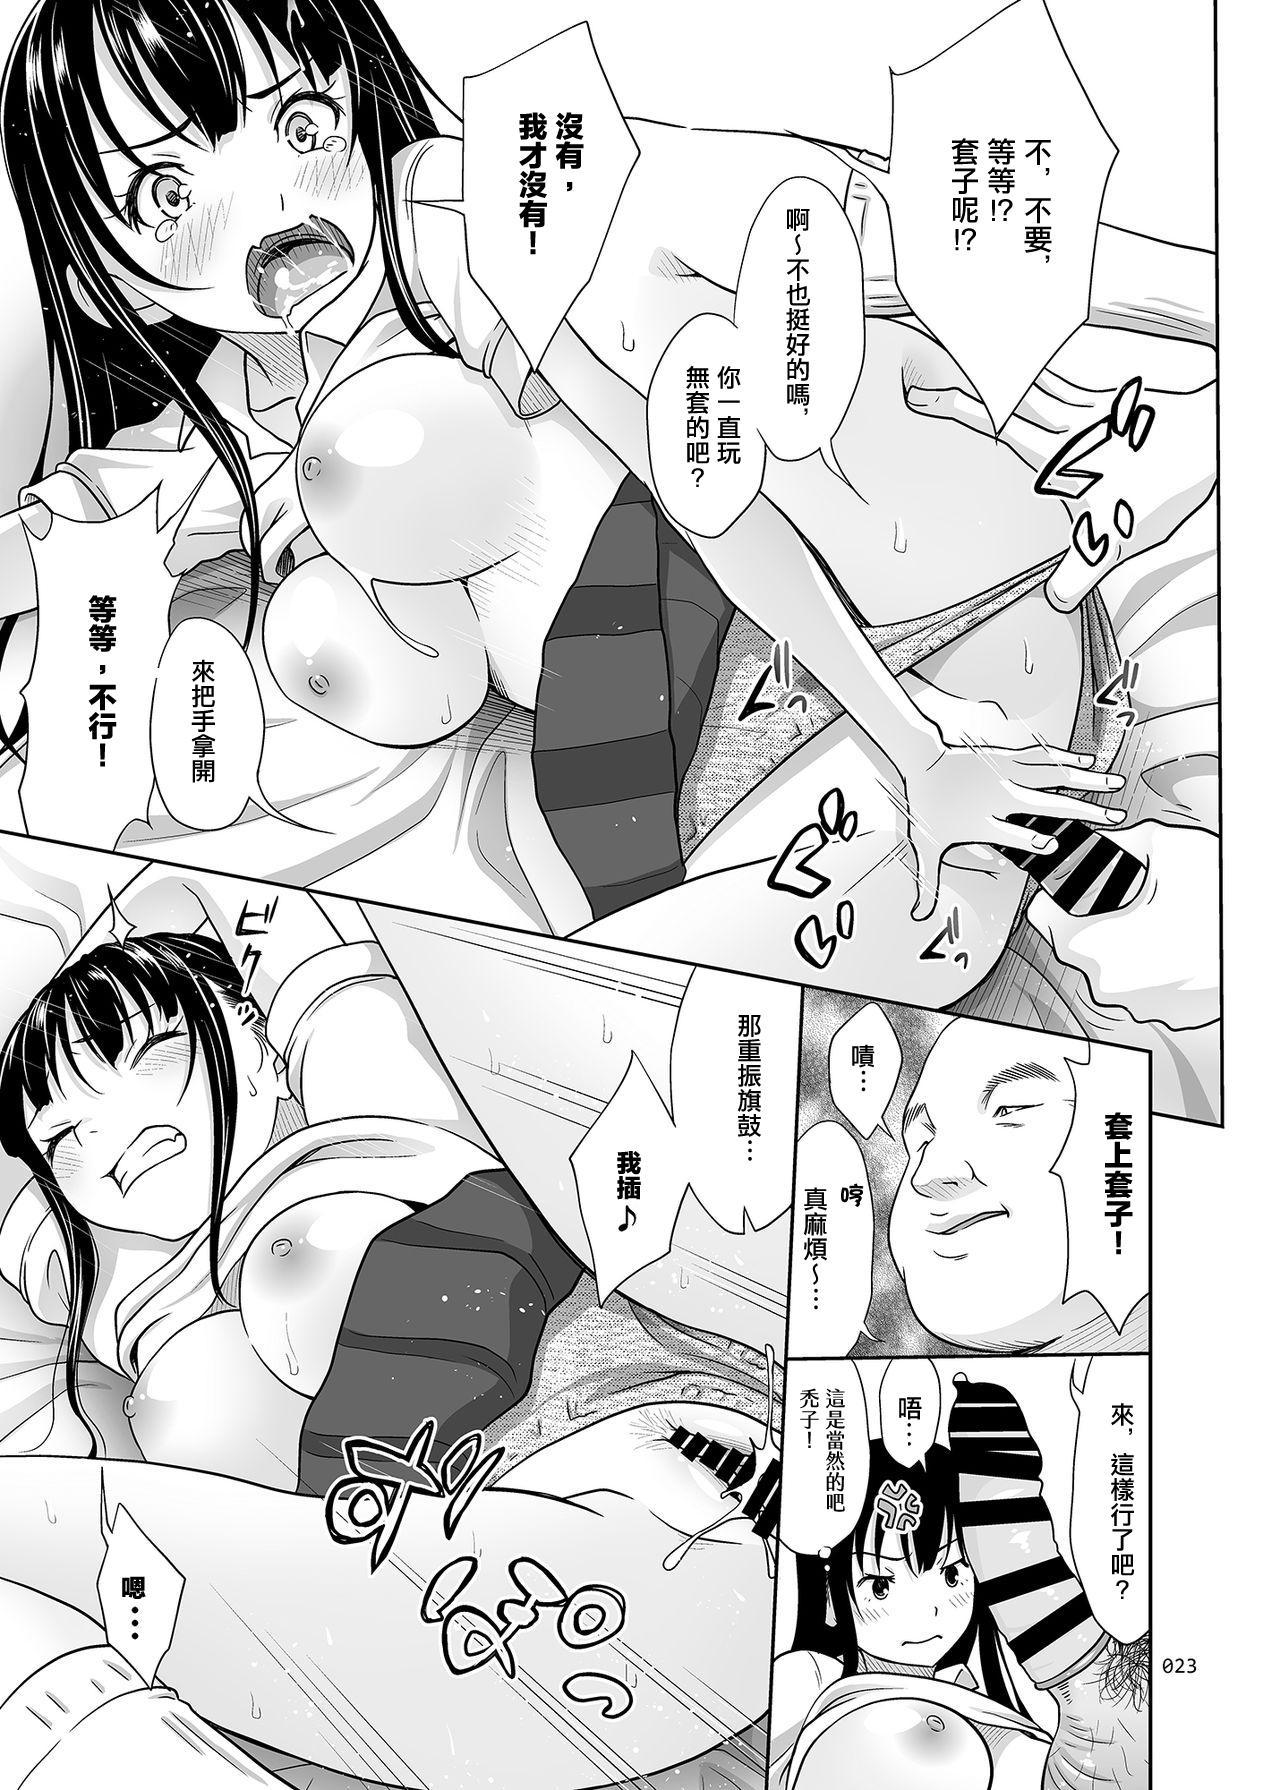 Yuna-chan no Ichinichi   優奈醬的一日 22